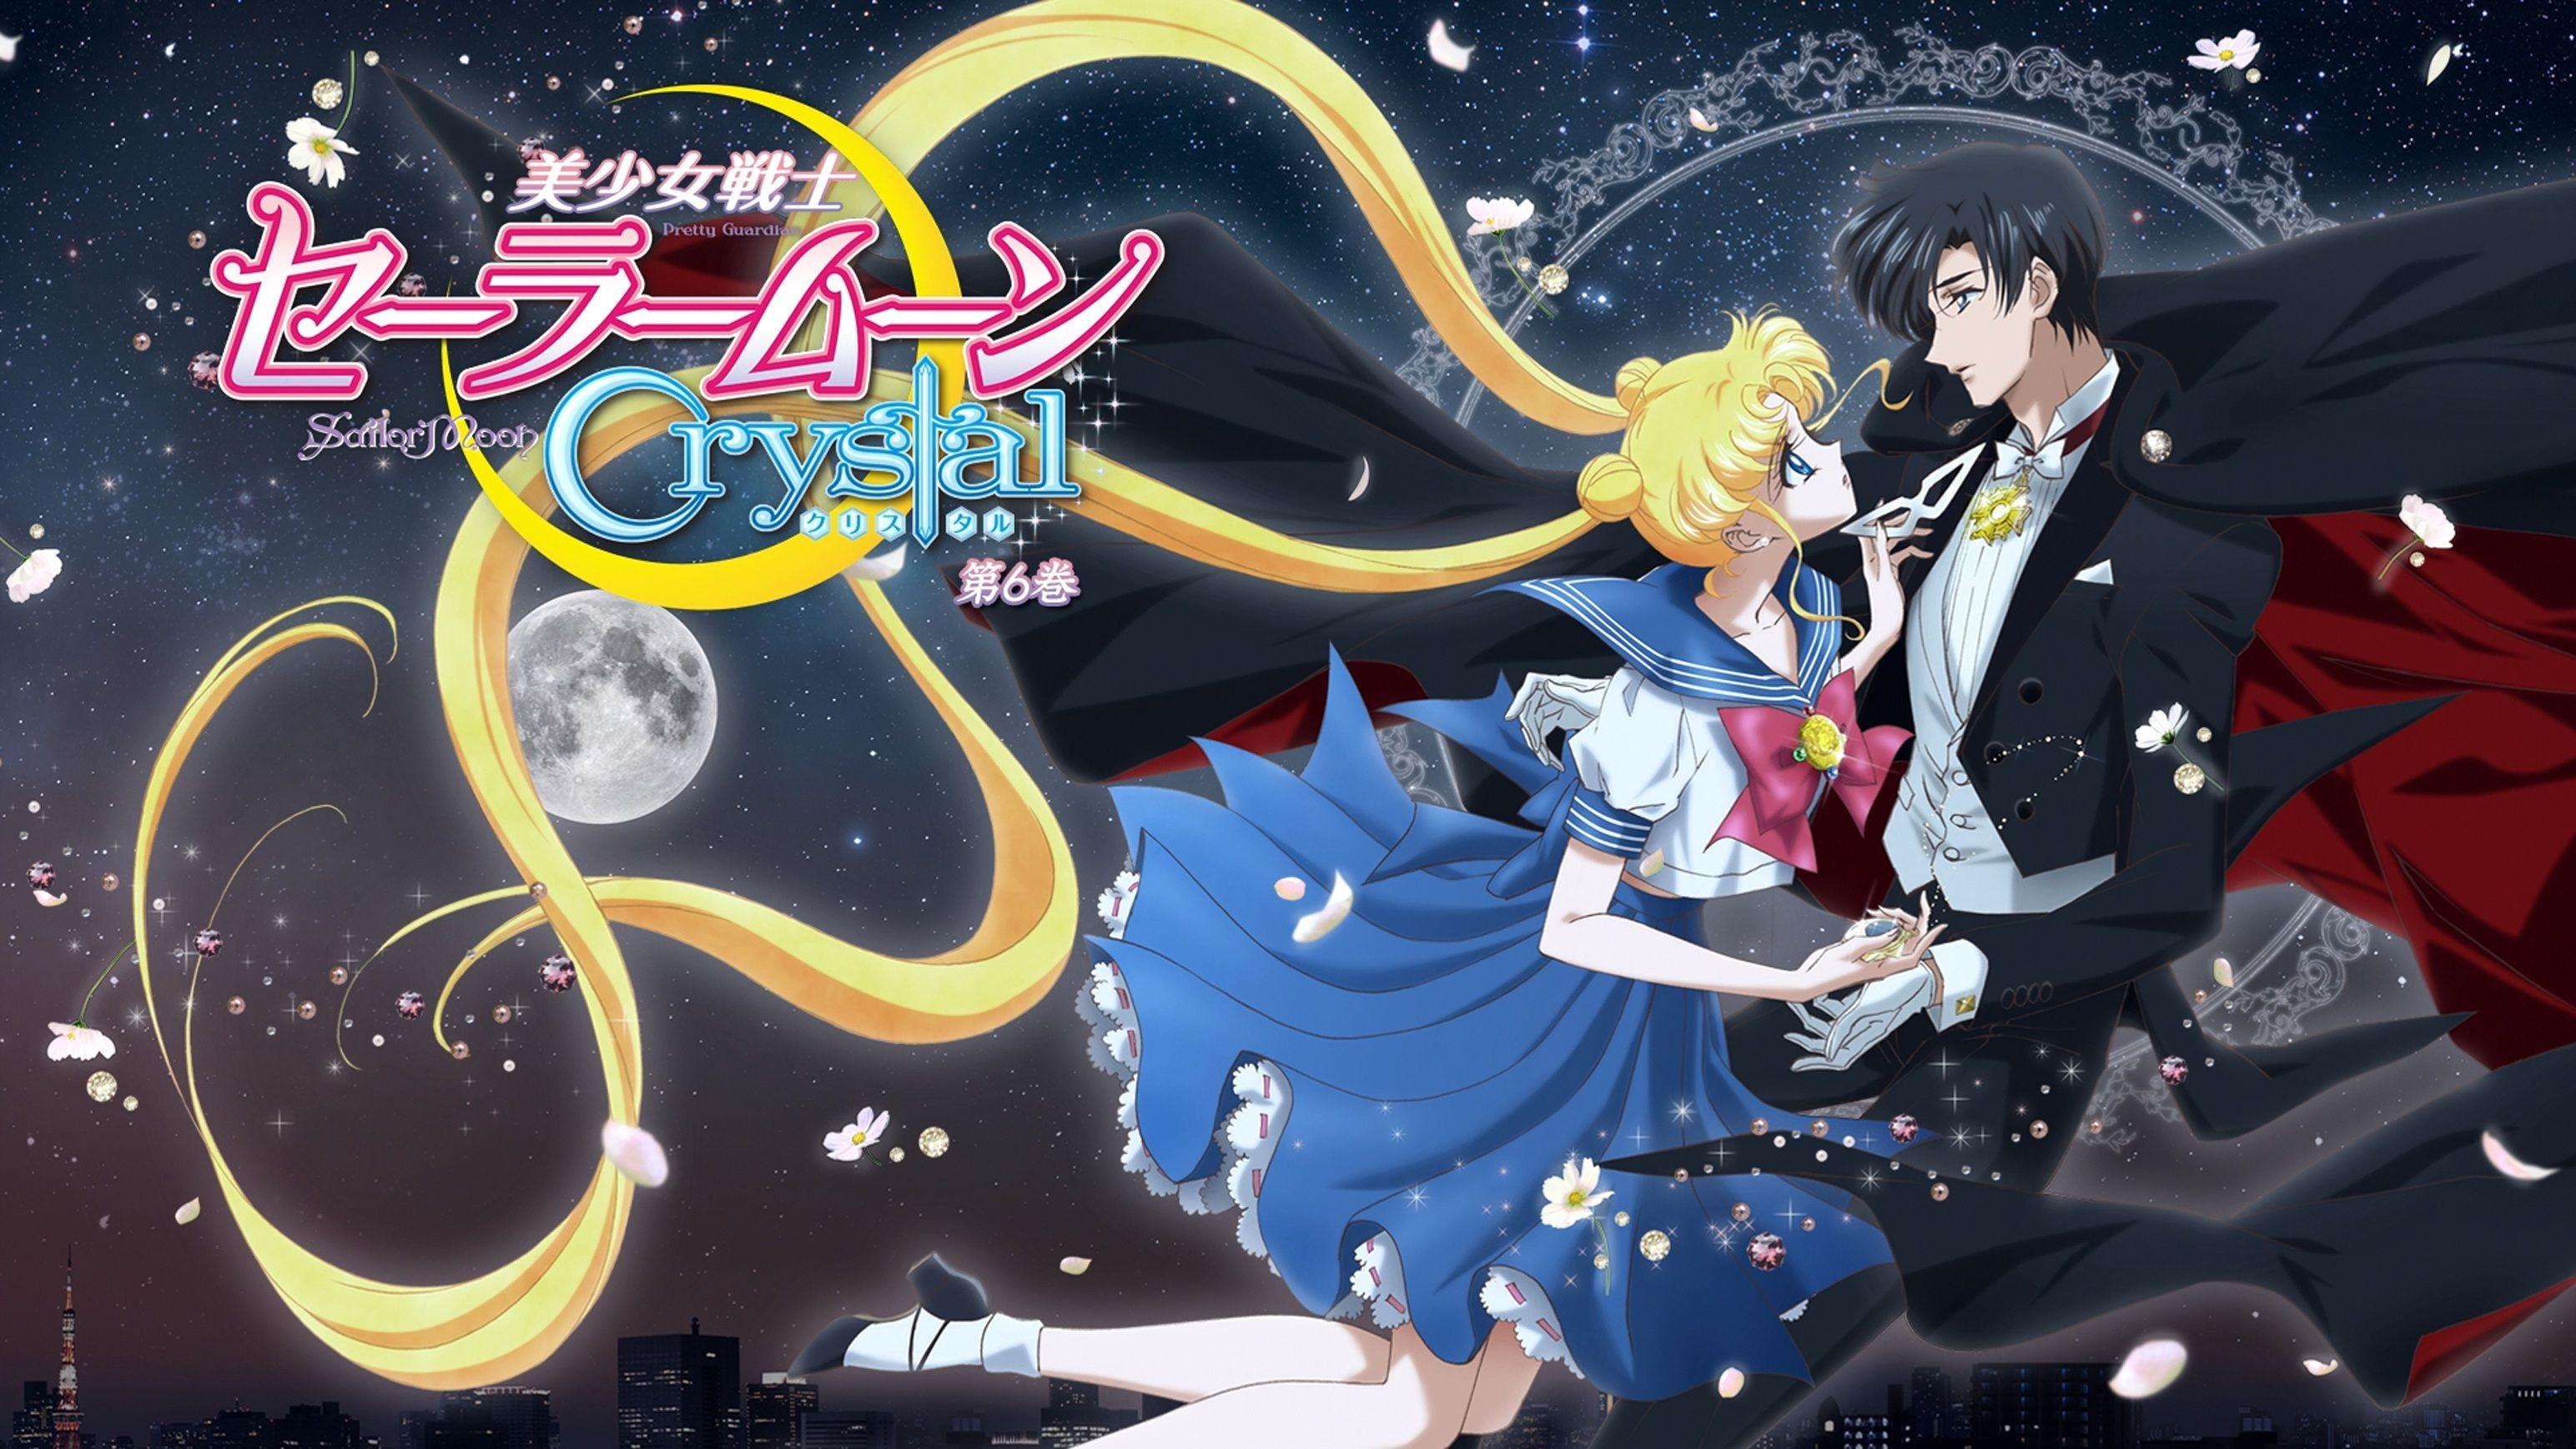 Wallpaper HD Sailor Moon Crystal DVD 6 Sailor moon